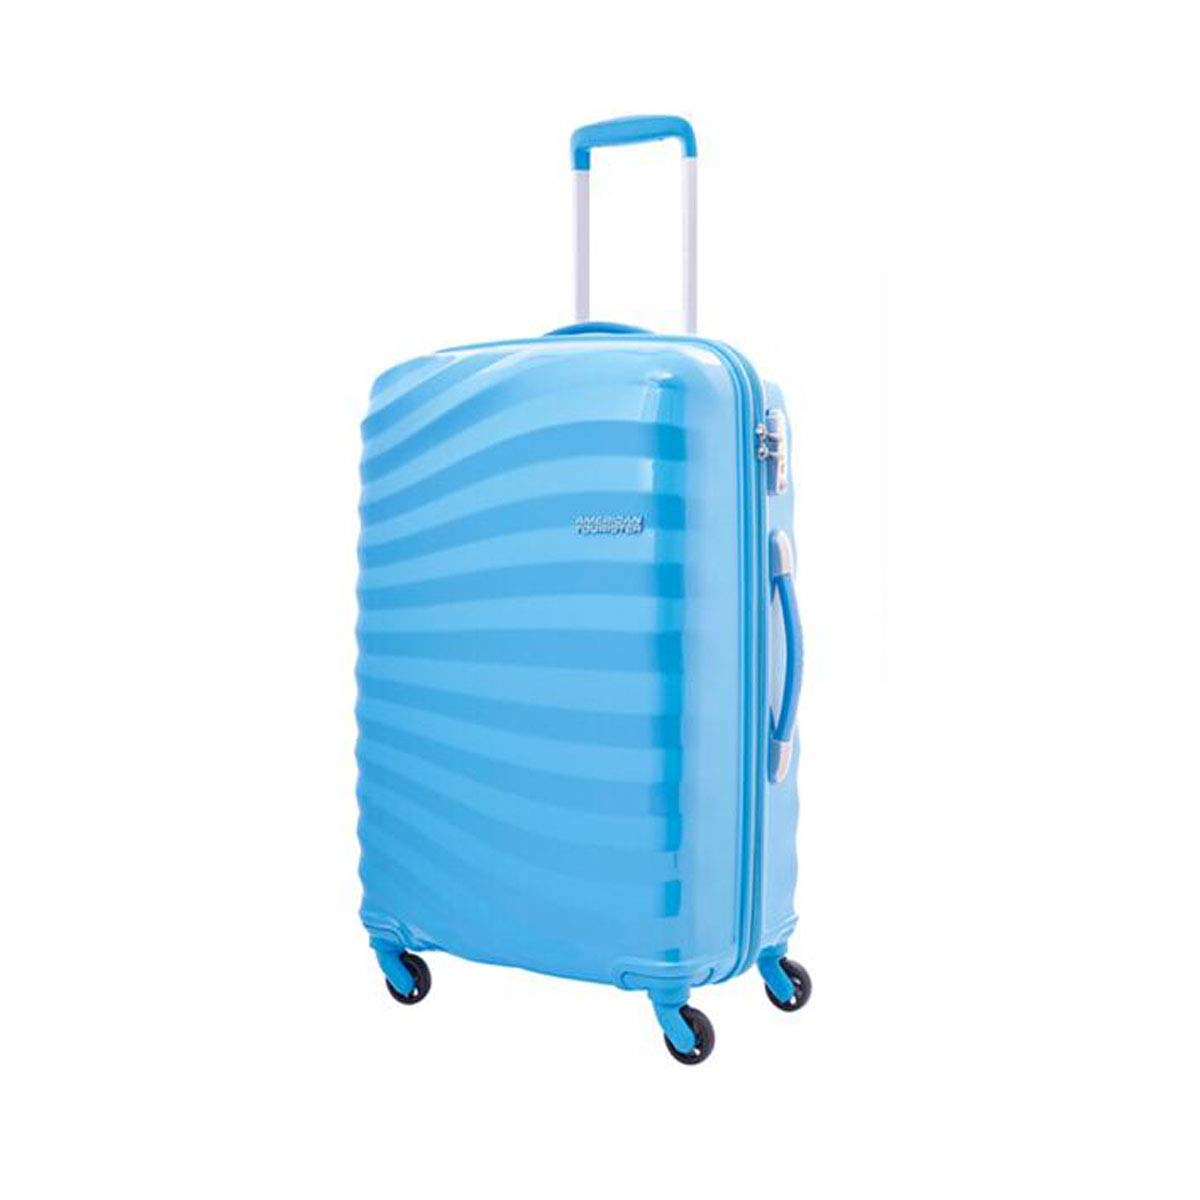 Aishanghuayi スーツケース 耐摩耗 傷防止 ハードケース ローリング TSAロック スーツケース カラー ピンク サイズ (46 29 67) cm (カラー : スカイブルー サイズ : 191227インチ)   B07MT8BTRR